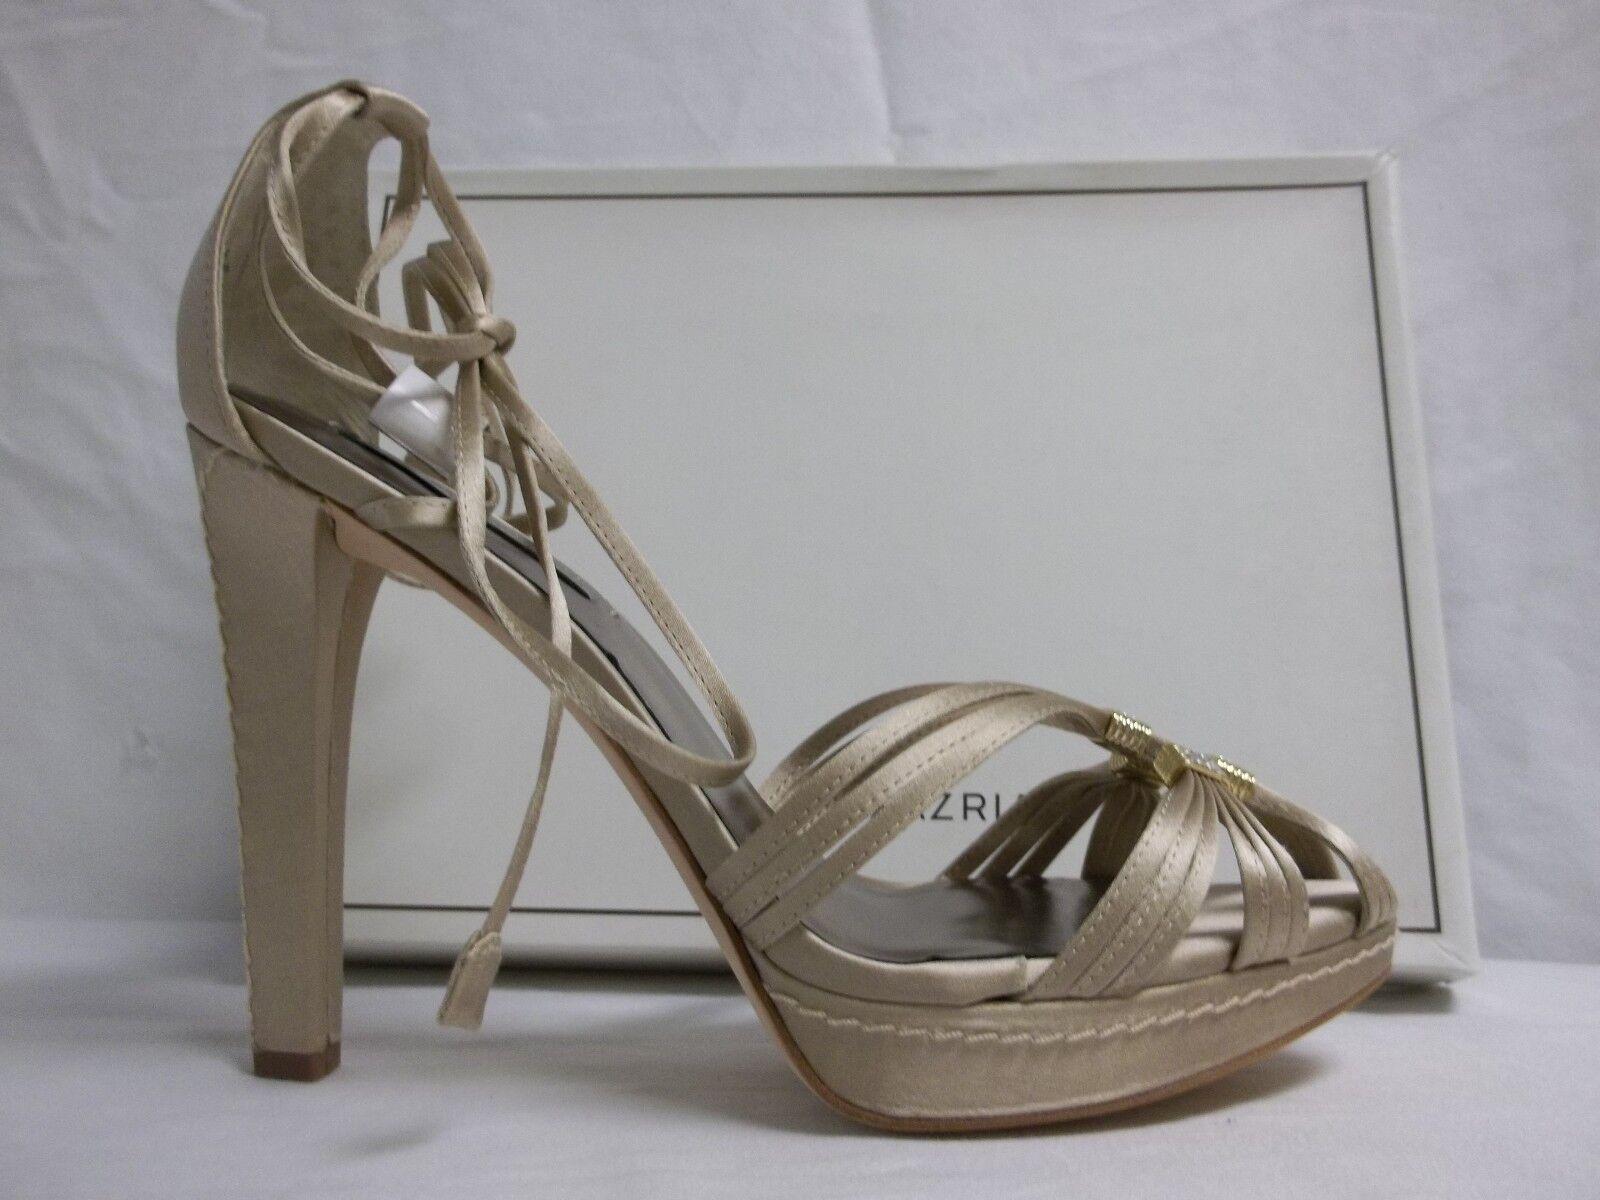 BCBG Max Azria Azria Azria Größe 10 M Elise Champagne Satin Open Toe Heels New damen schuhe 583a39